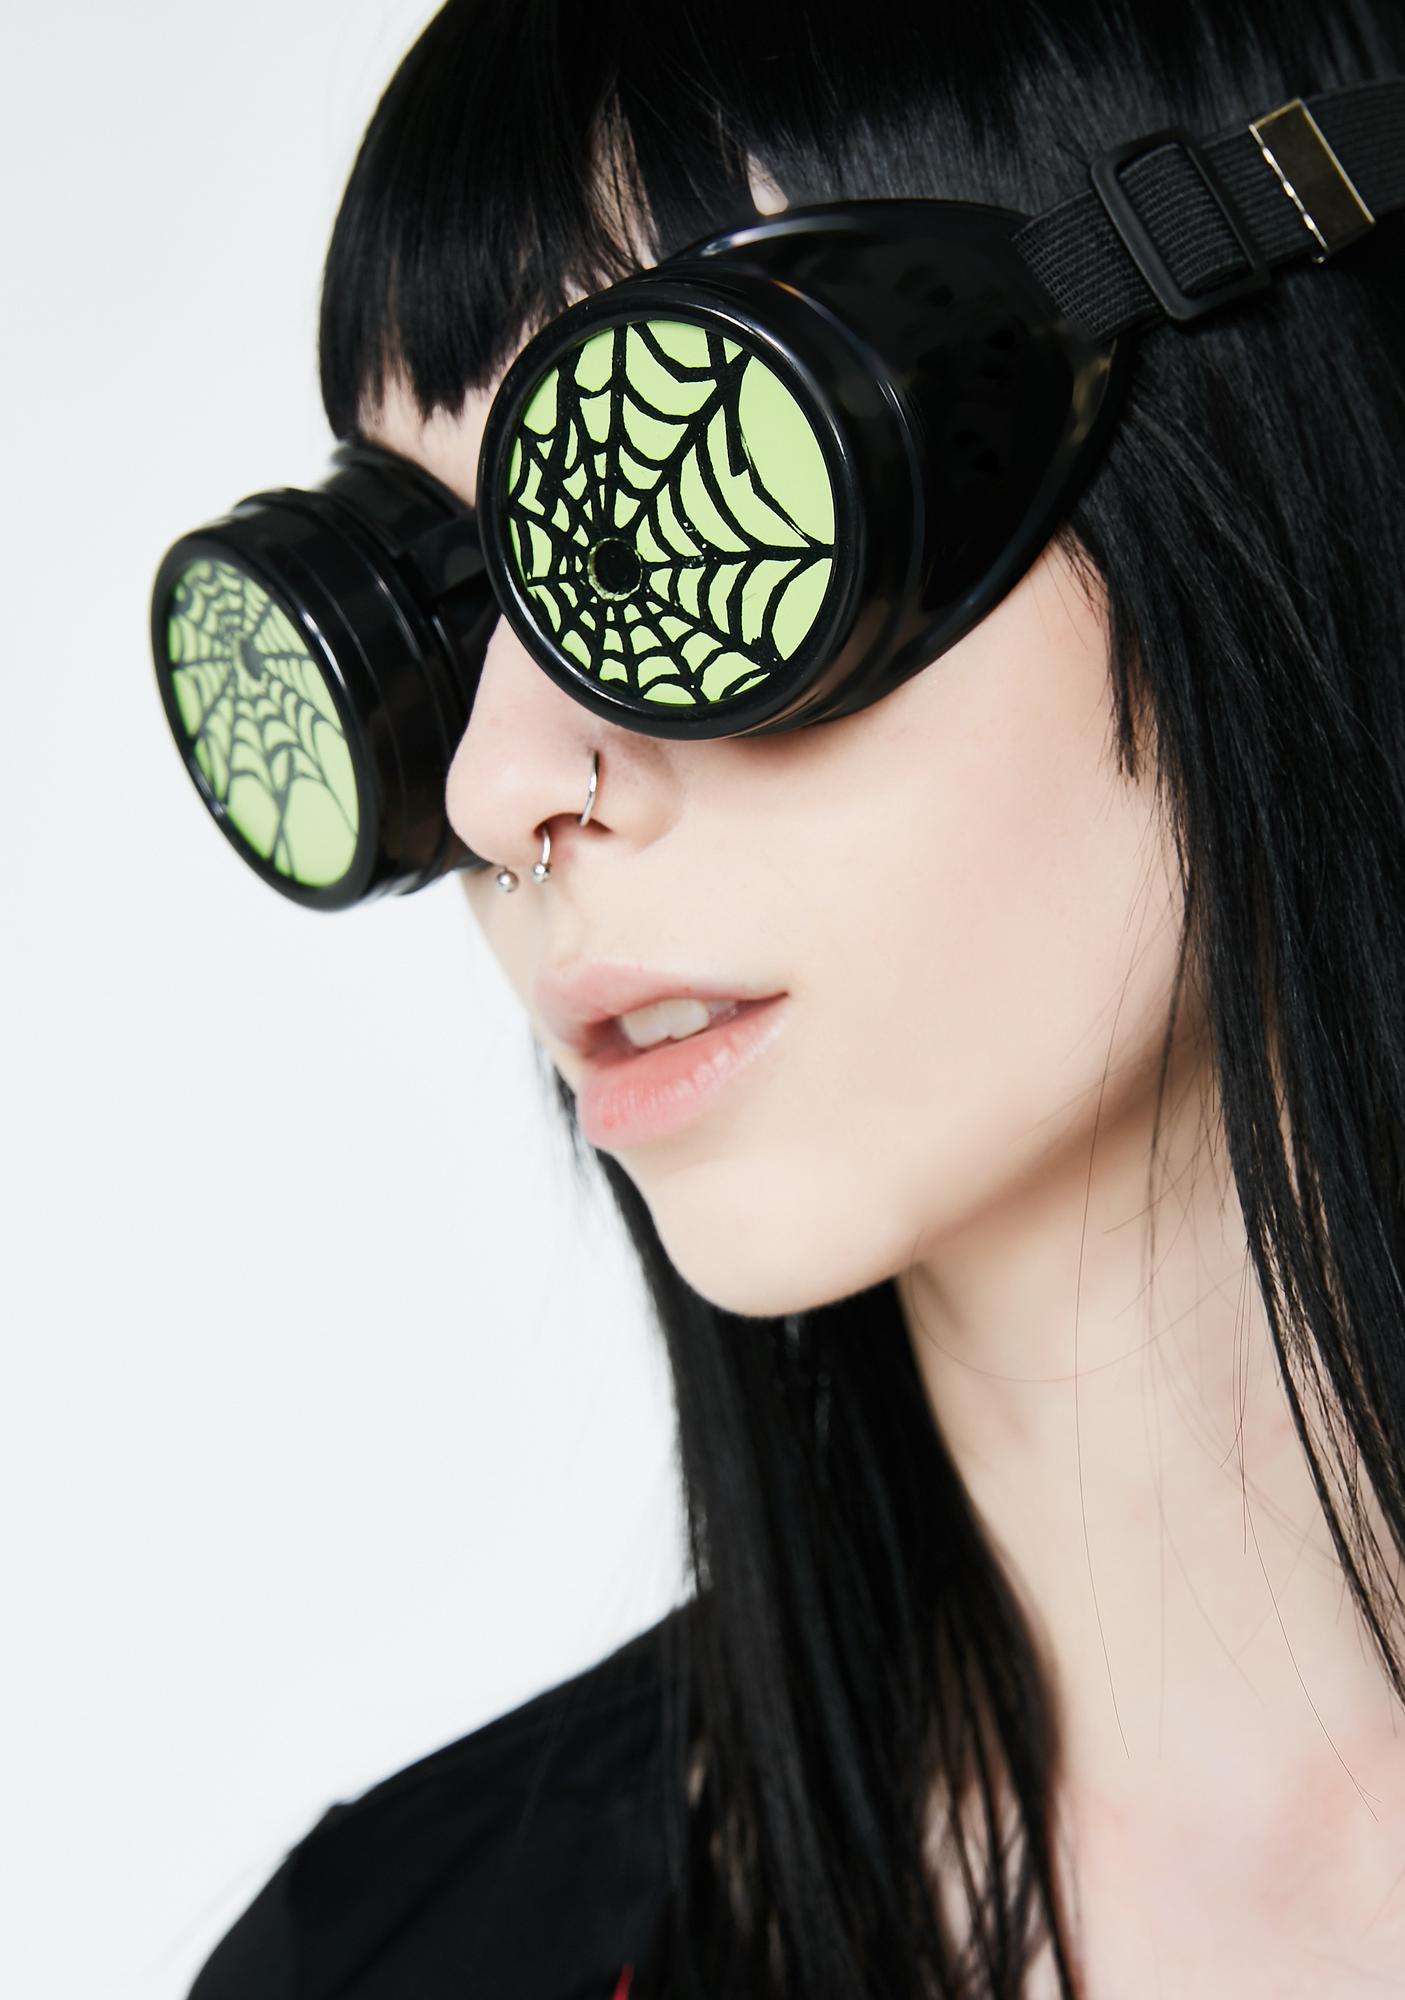 Spidey Senses Goggles